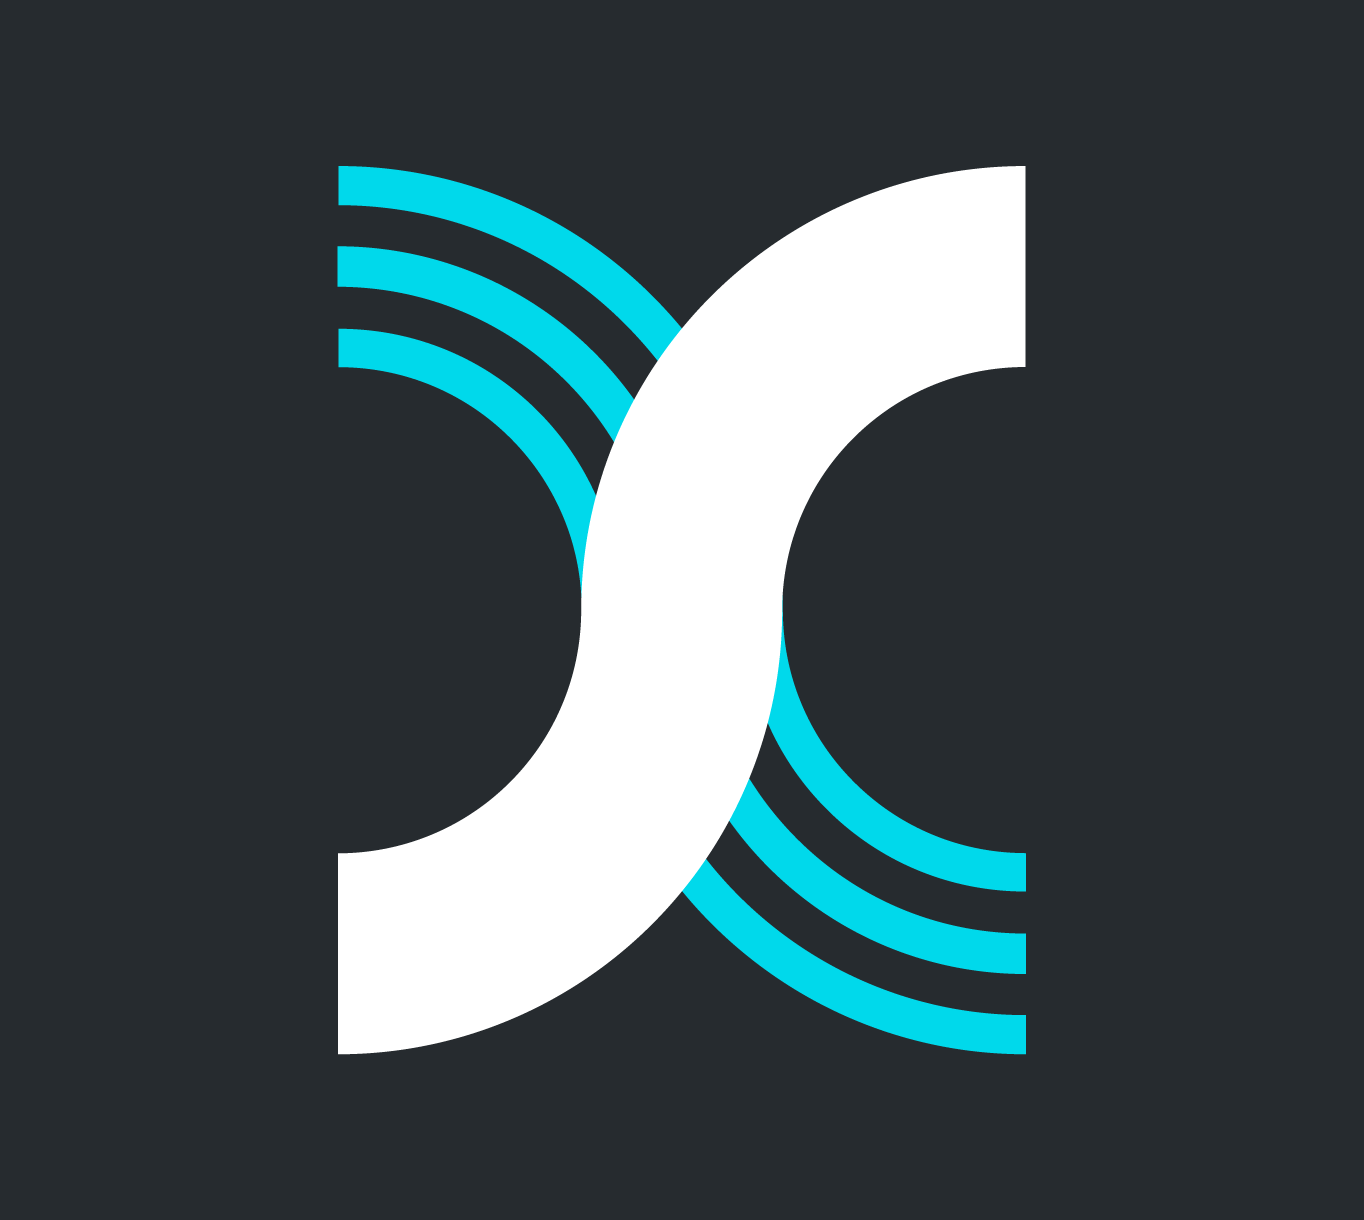 FORM MarketX logo